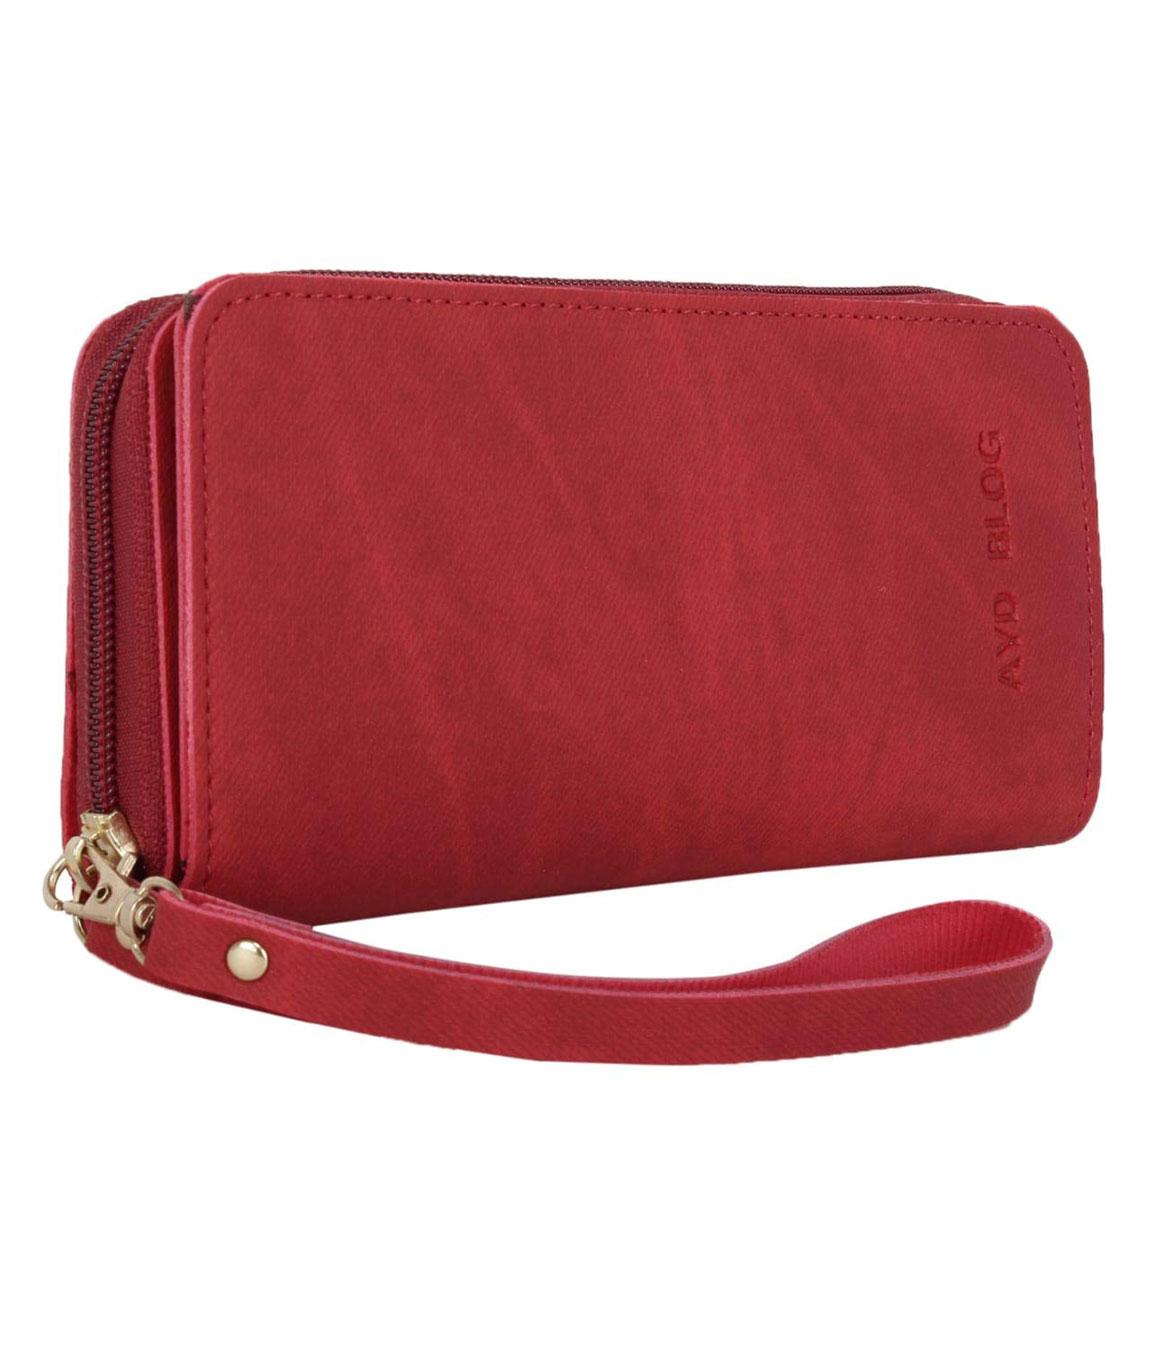 Talat Fashion PU Leather Stylish Wallet/Clutch/Purse for Women & Girls(red)